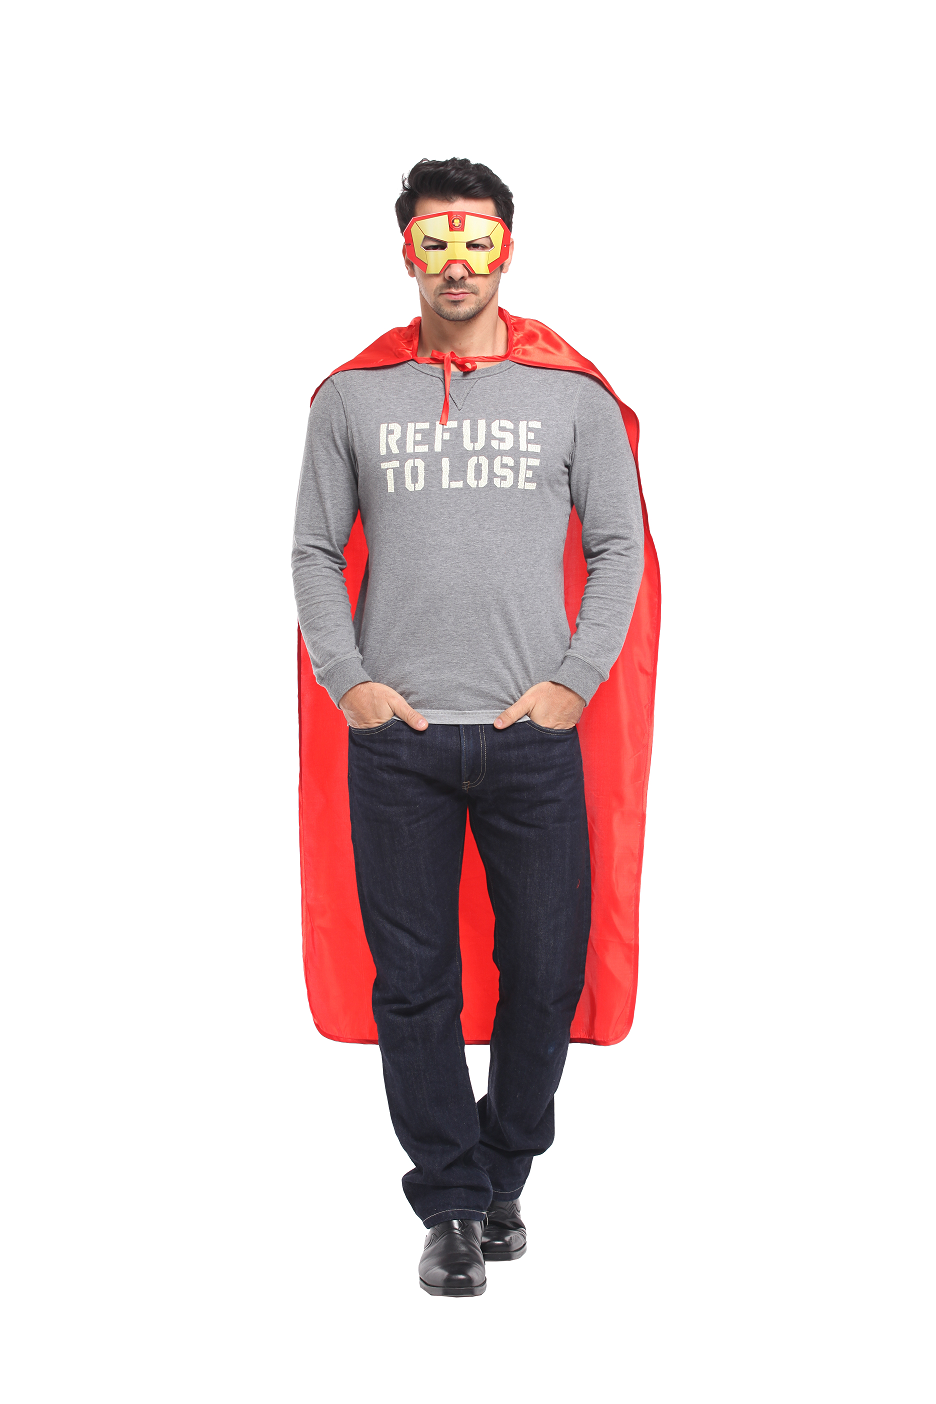 X射線【W276015】50鋼鐵英雄眼罩披風組,鋼鐵人/披風/萬聖節/化妝舞會/派對道具/變裝/表演/復仇者聯盟/cosplay/漫威/英雄